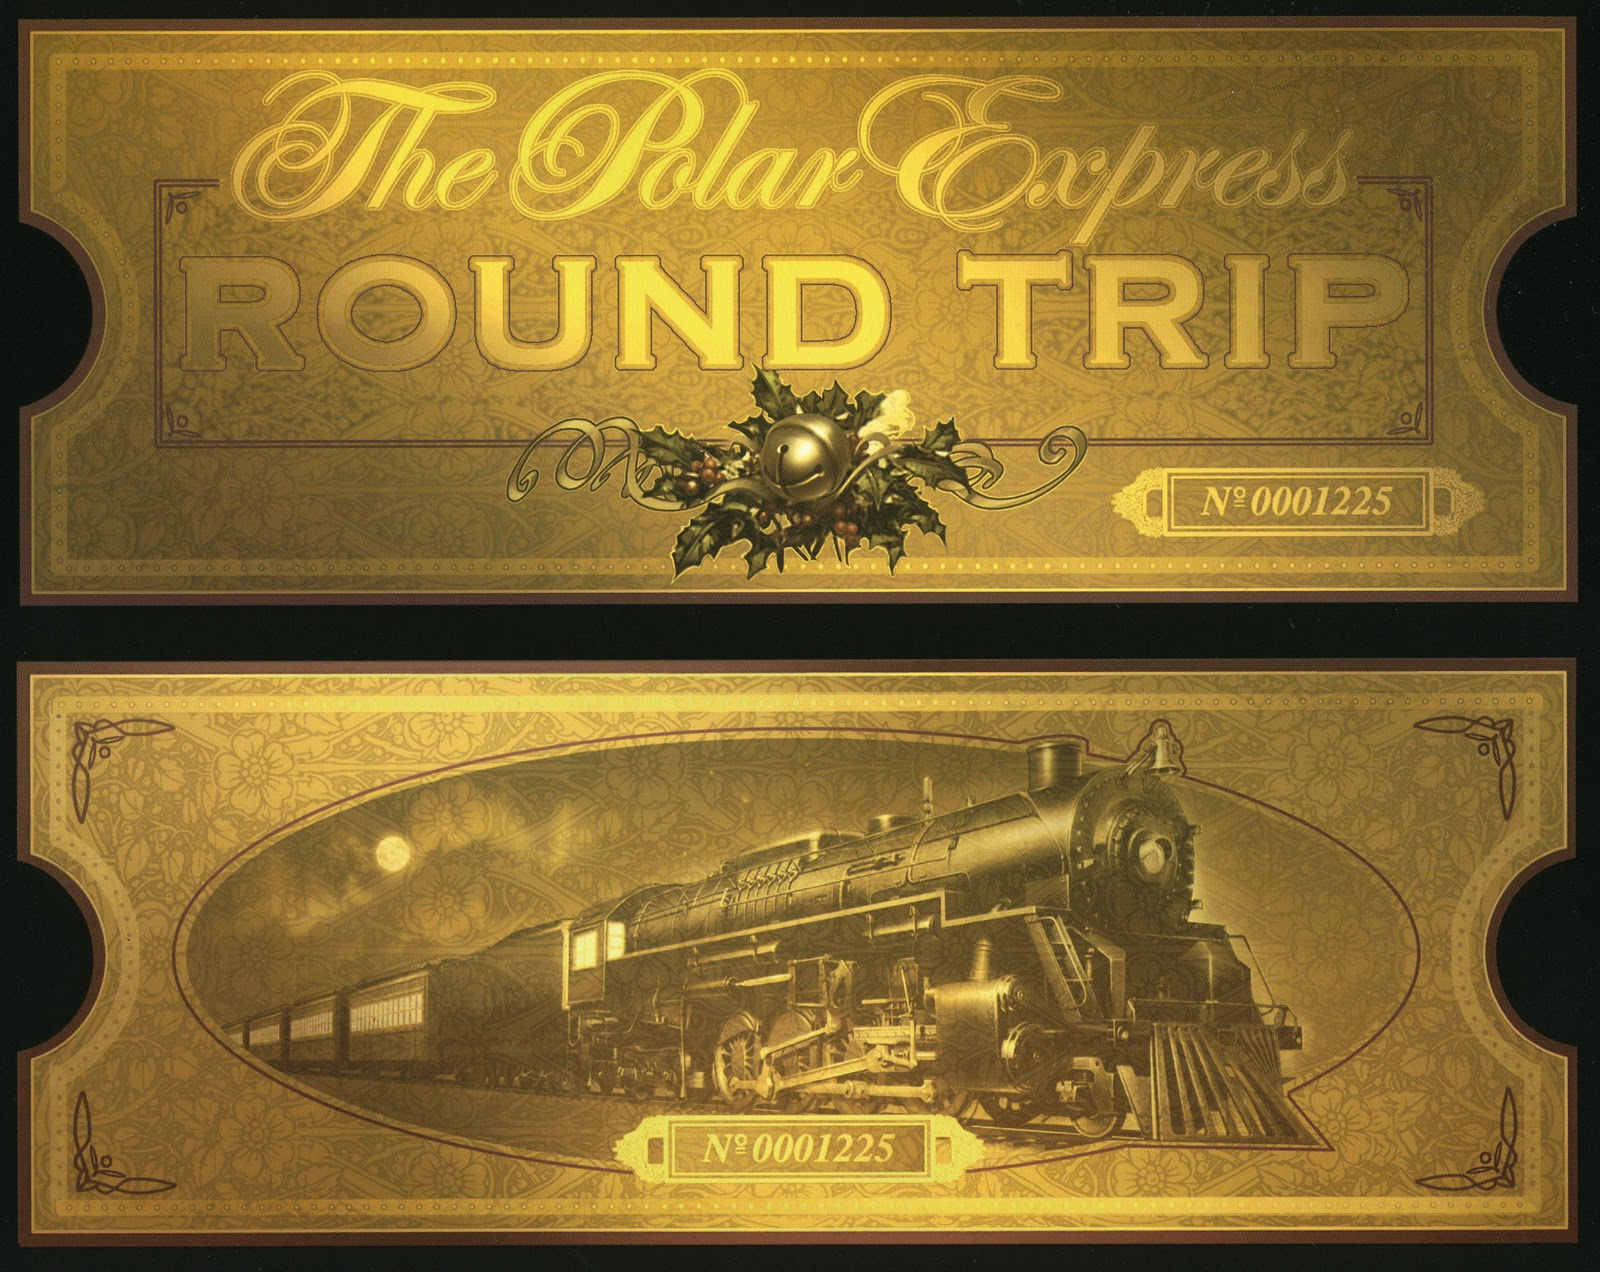 Polar express golden ticket clipart clip art Free Polar Train Cliparts, Download Free Clip Art, Free Clip ... clip art